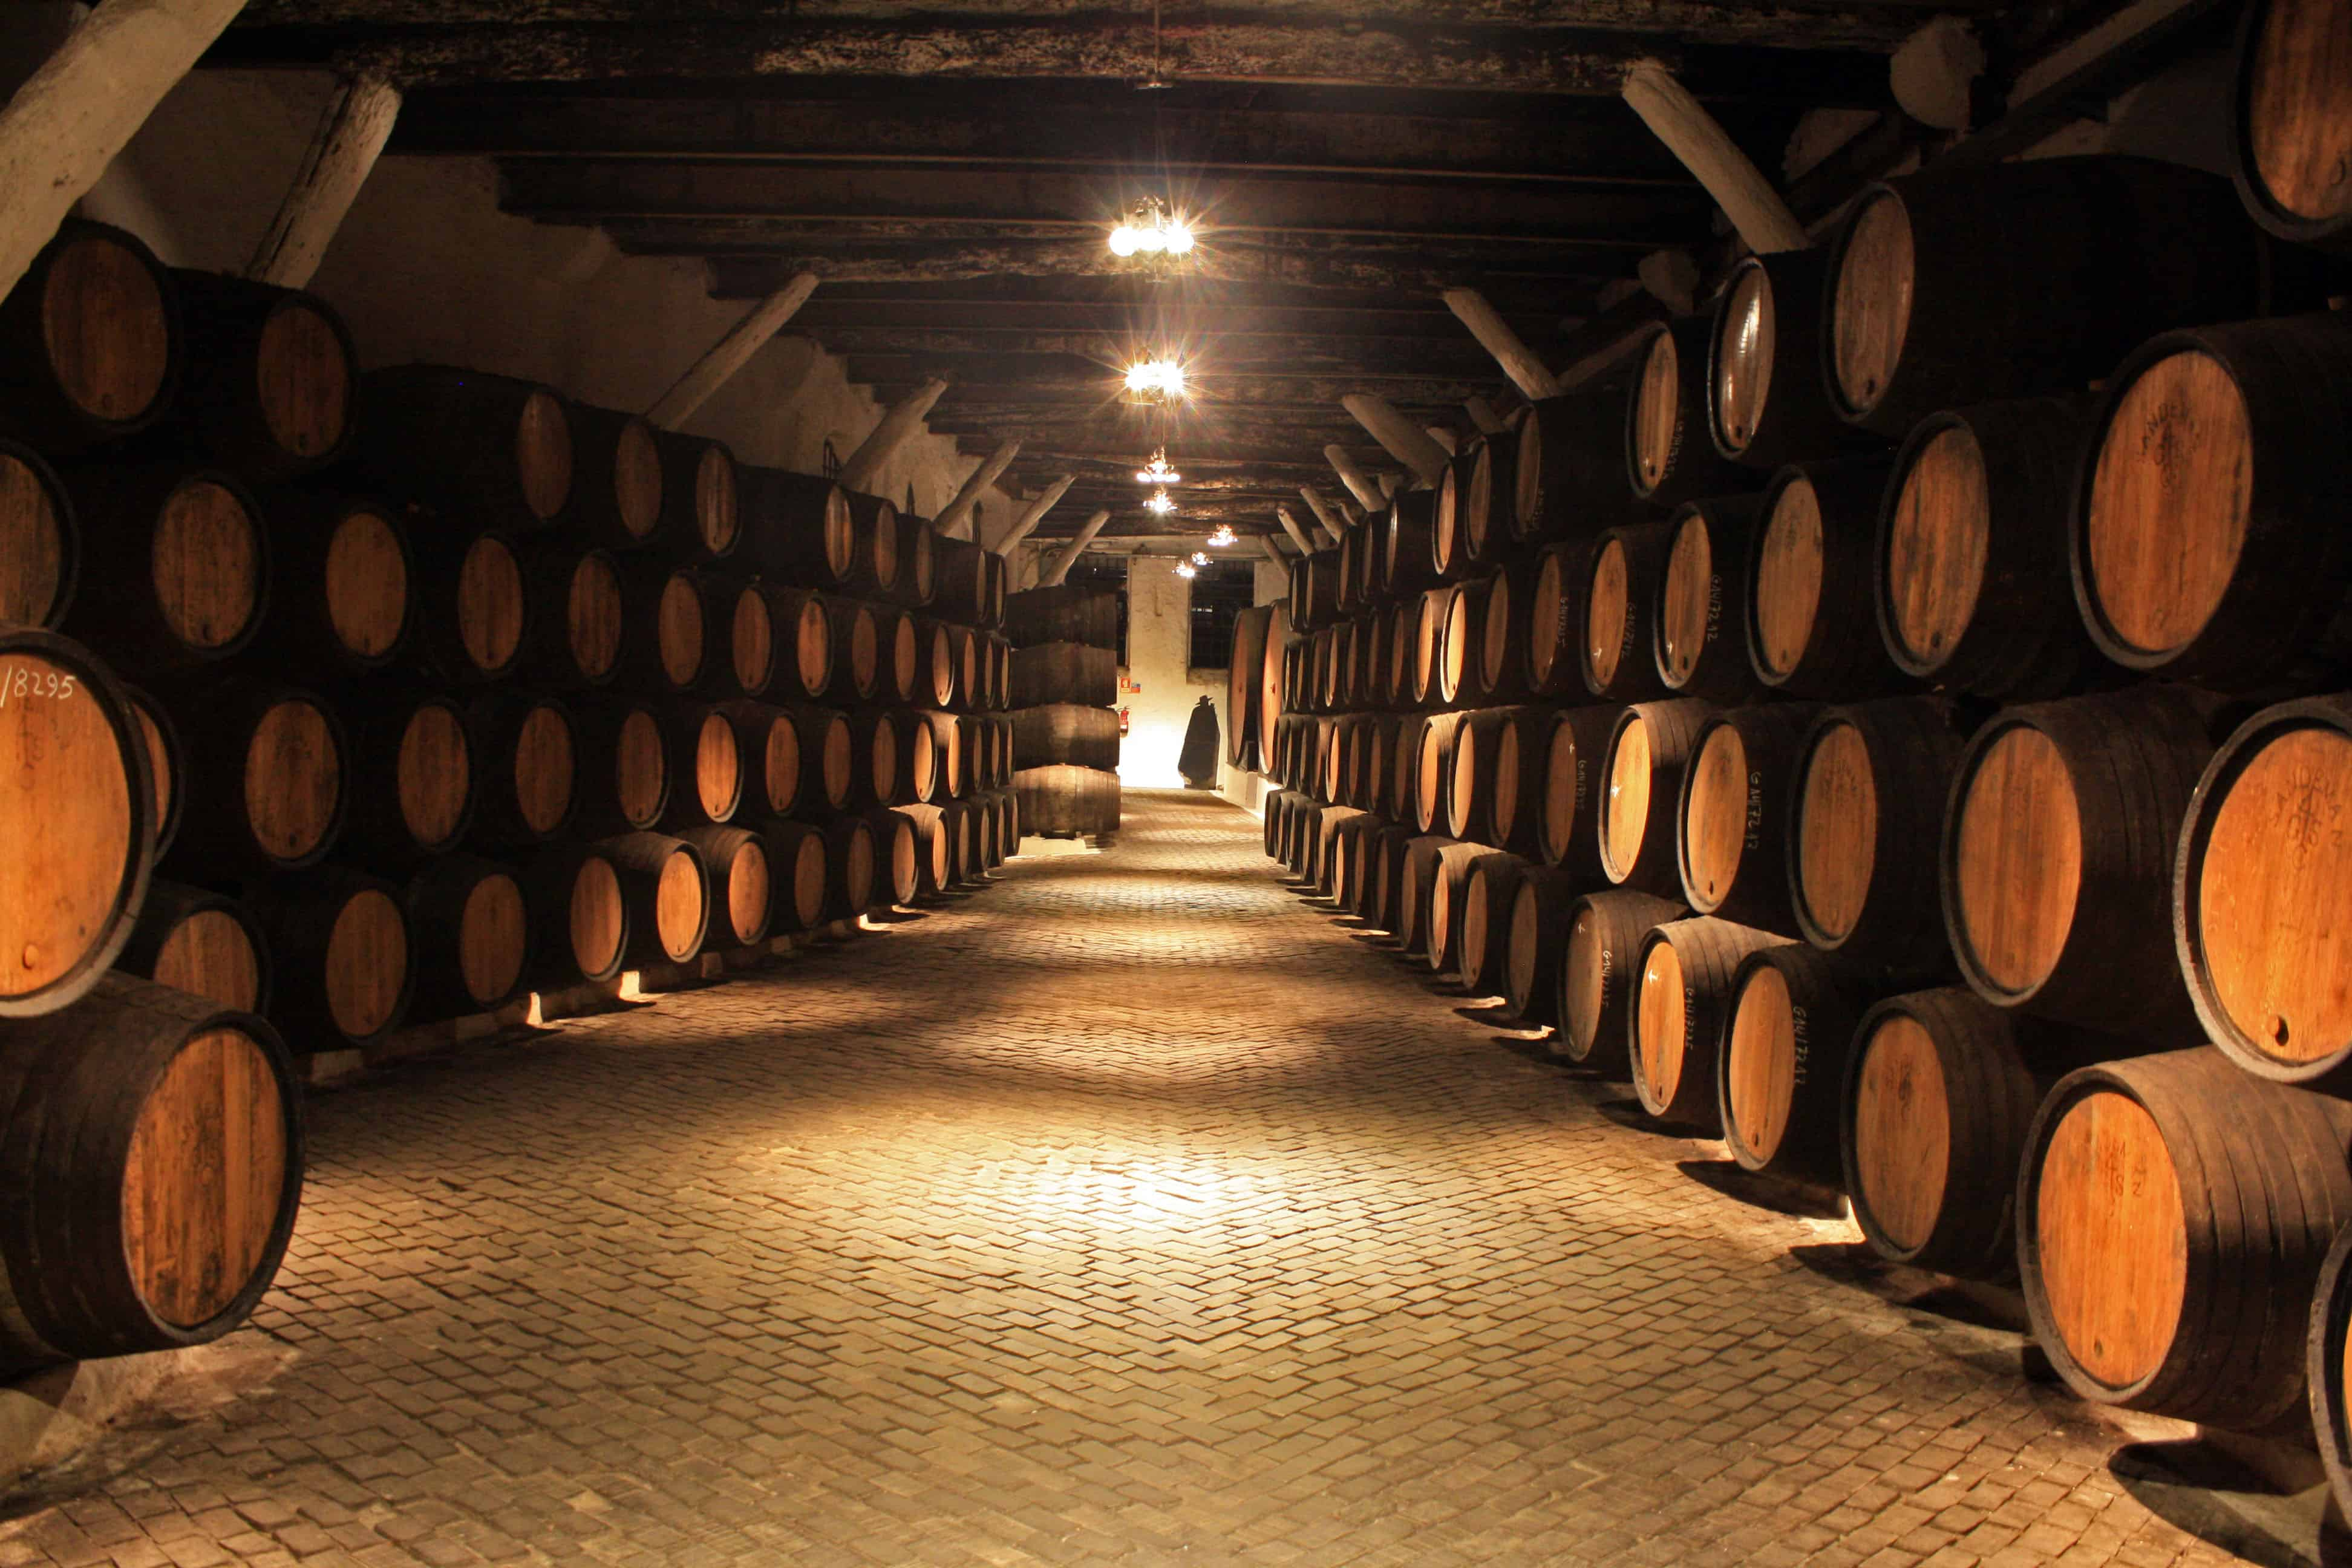 Sandeman Port wine cellars